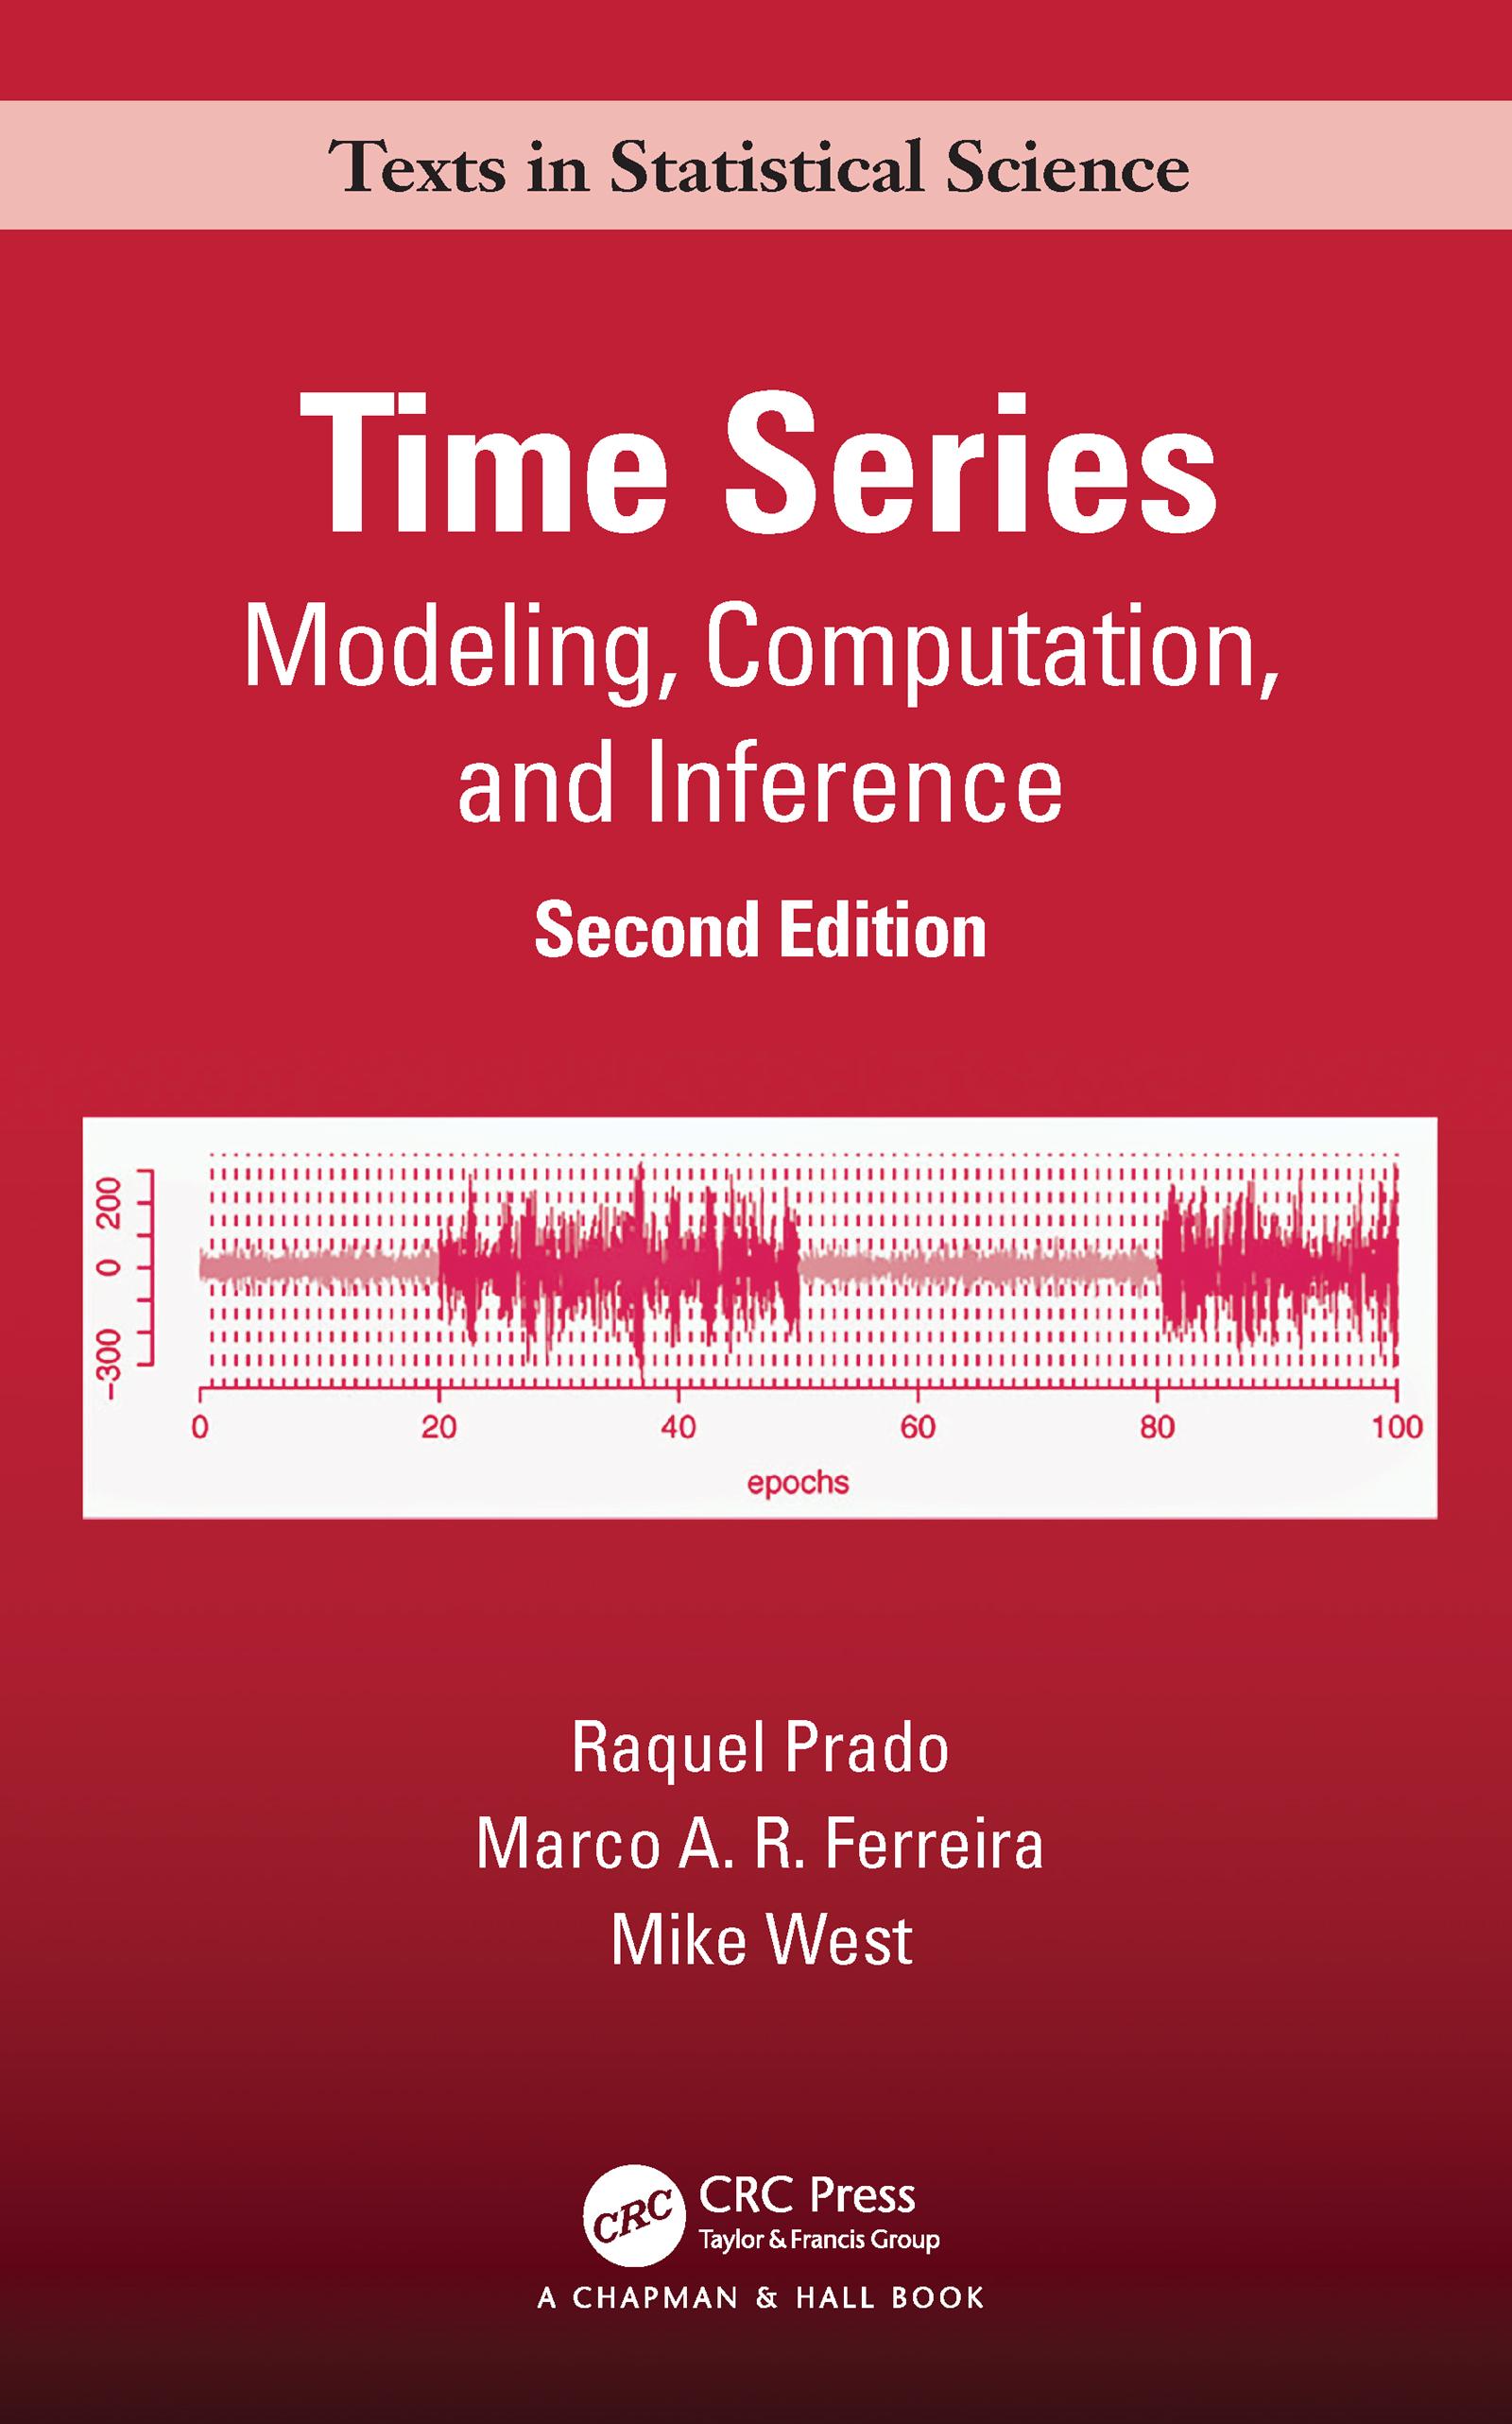 Mixture models in time series